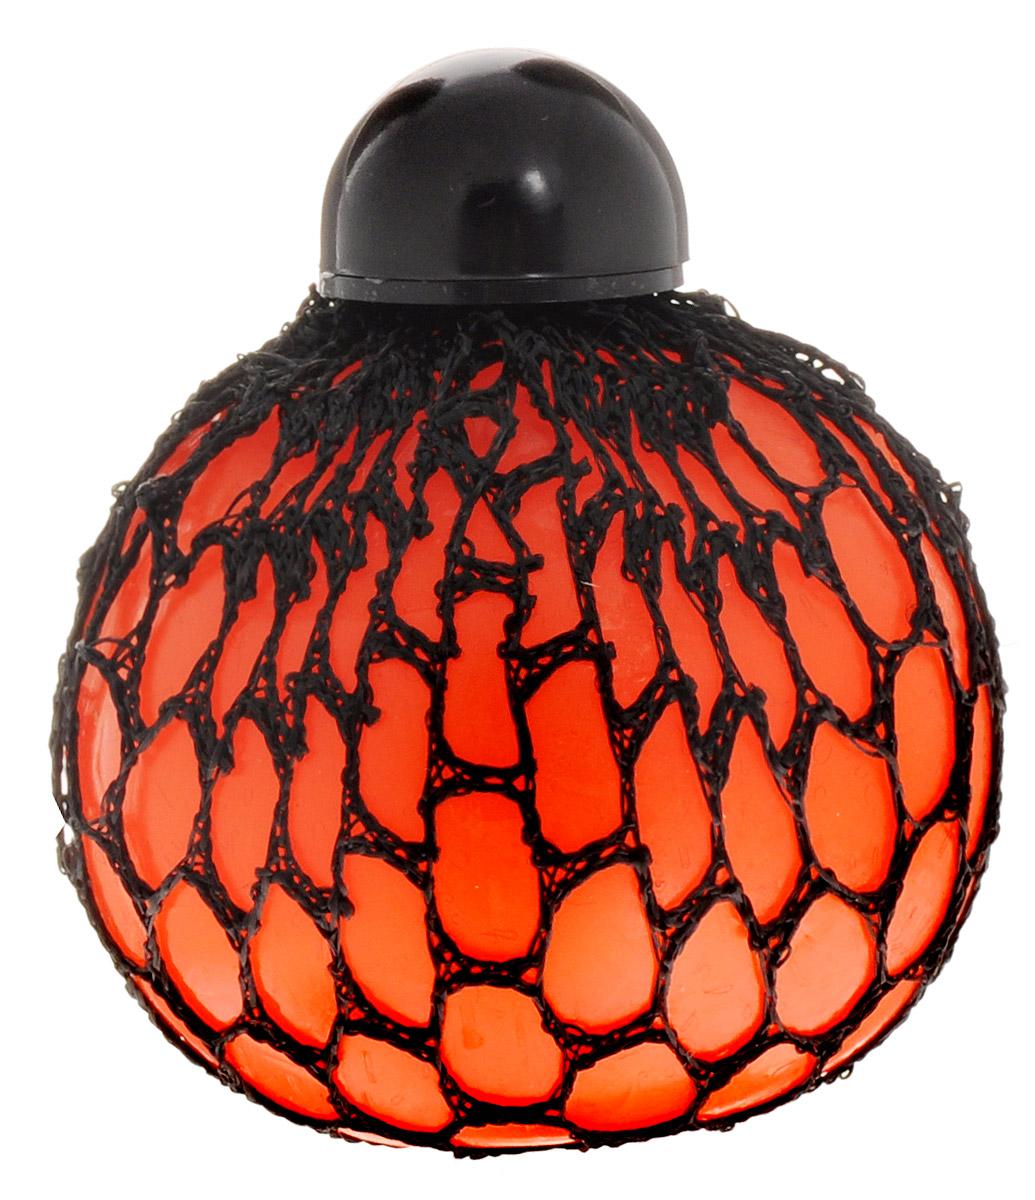 Family Fun Стрессбол Жмяка Мини цвет ярко-оранжевый